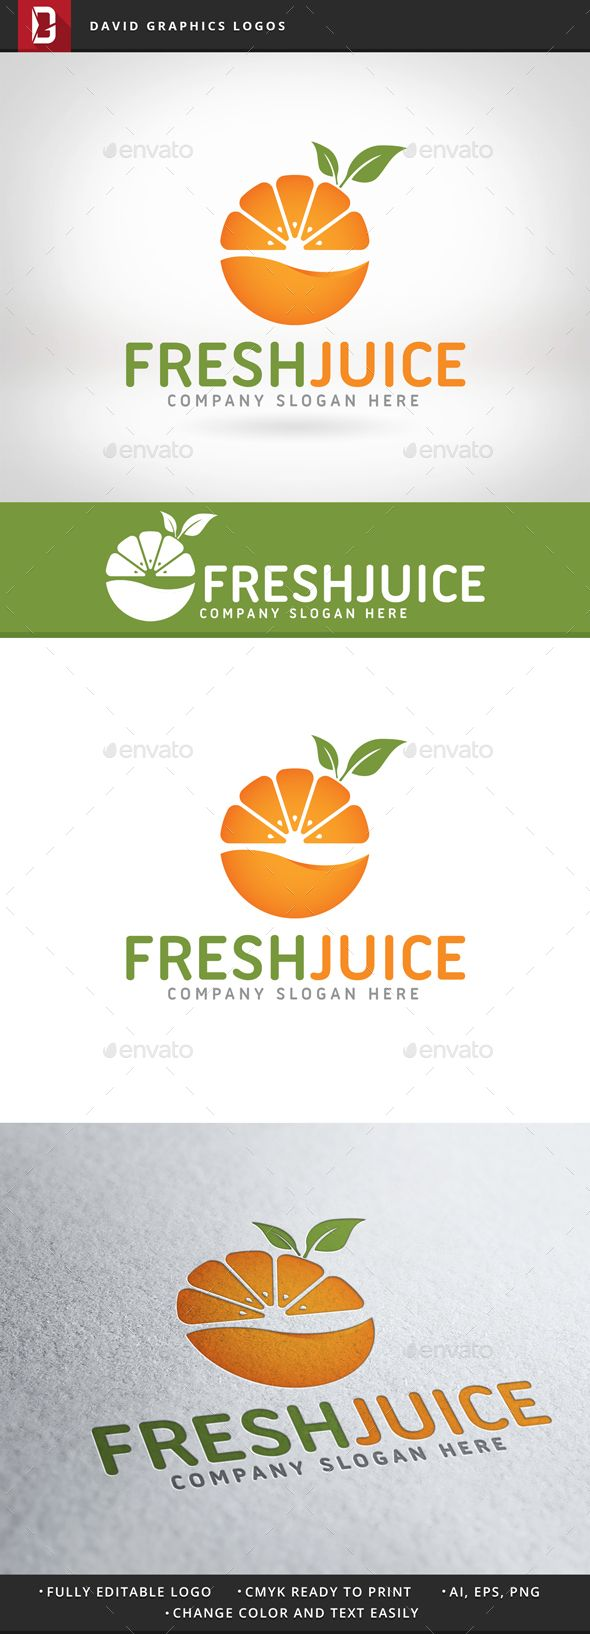 best 25 juice logo ideas on pinterest police brand